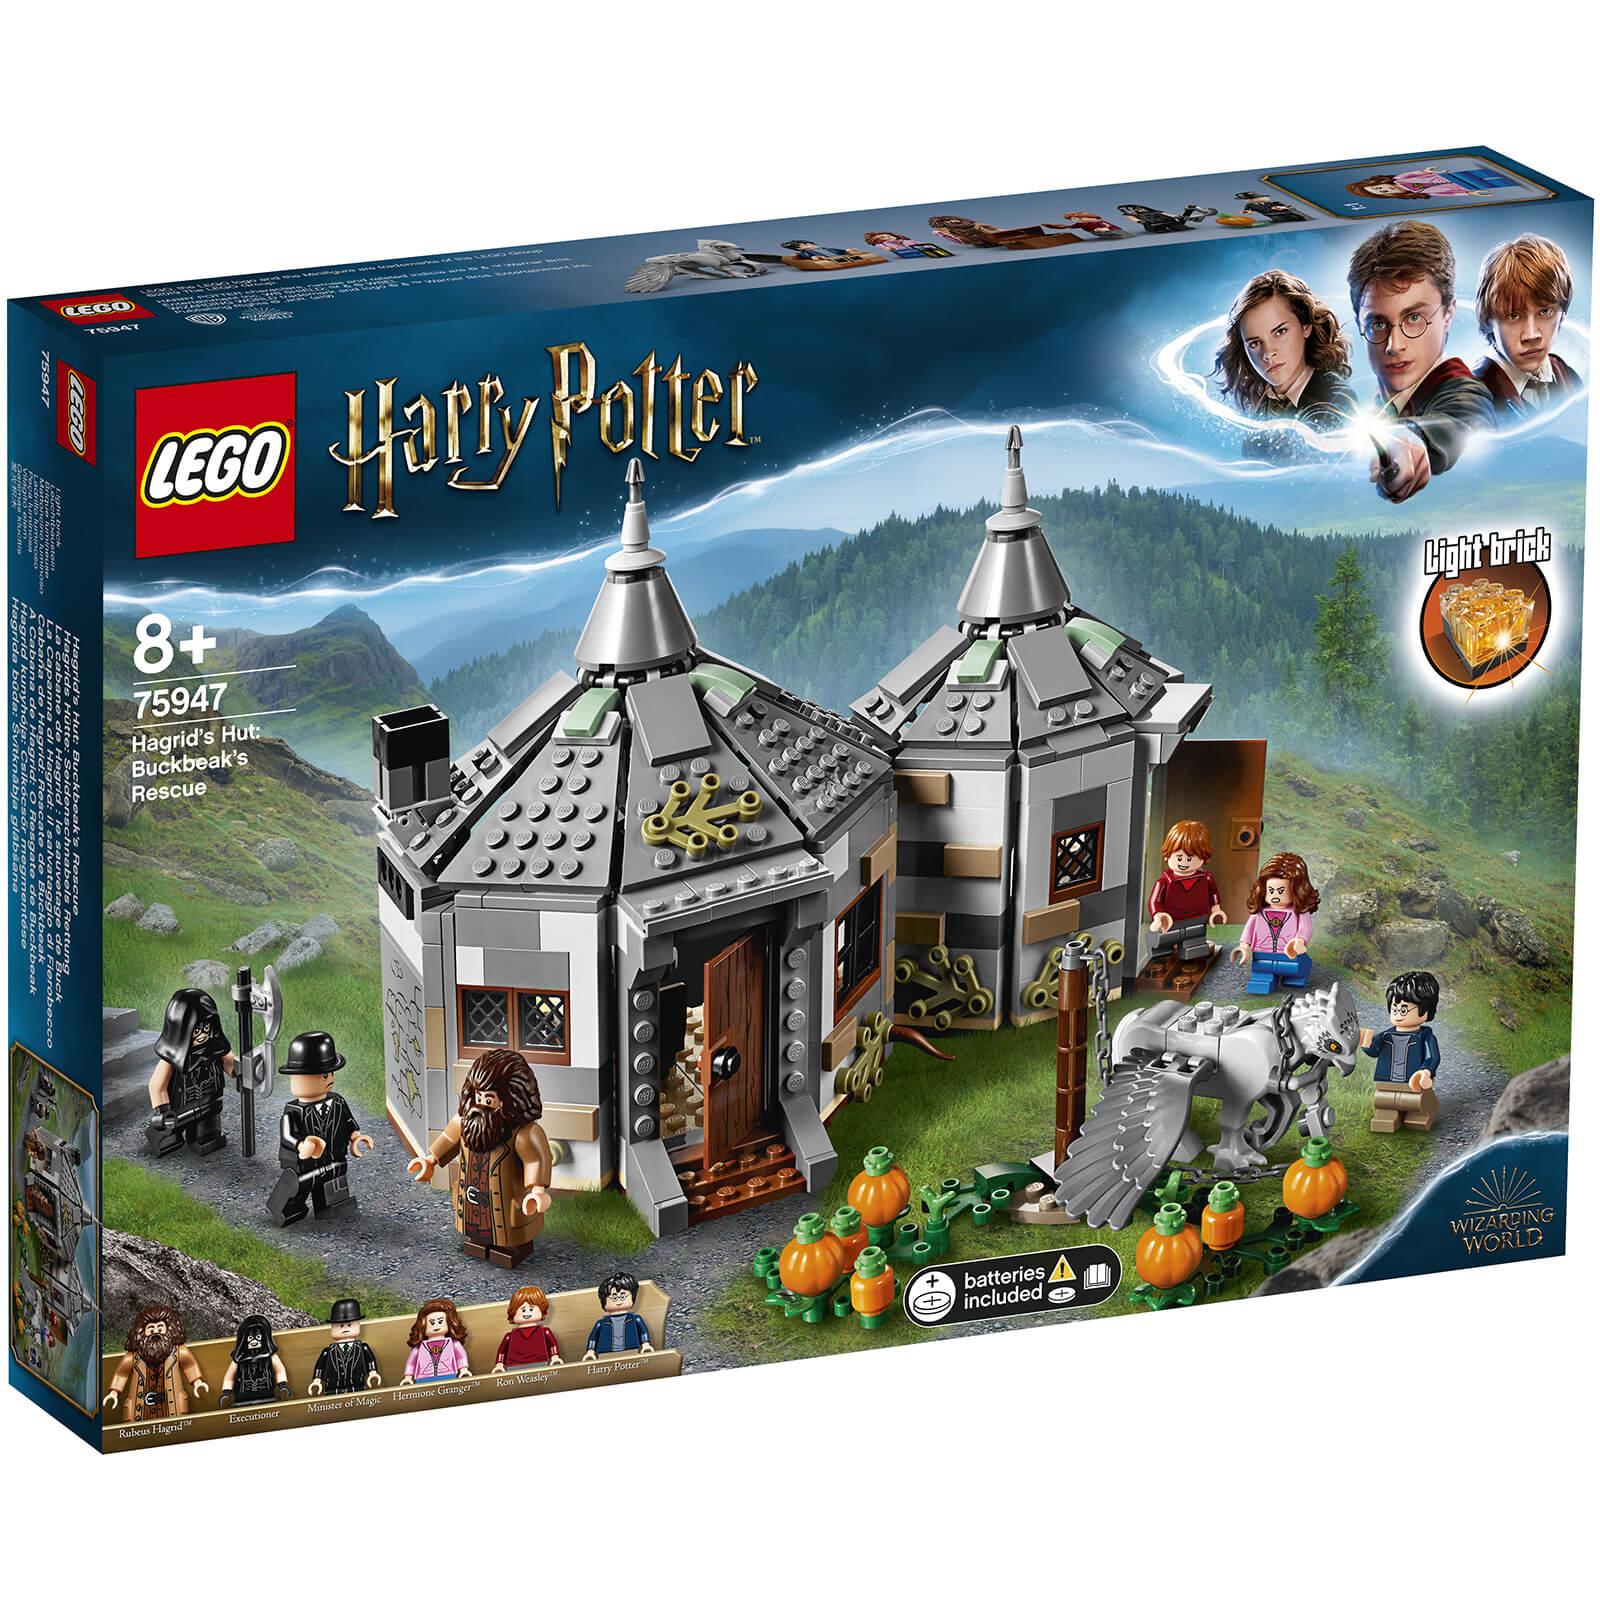 Lego Harry Potter: Hagrid's Hut Buckbeak's Rescue (75947)